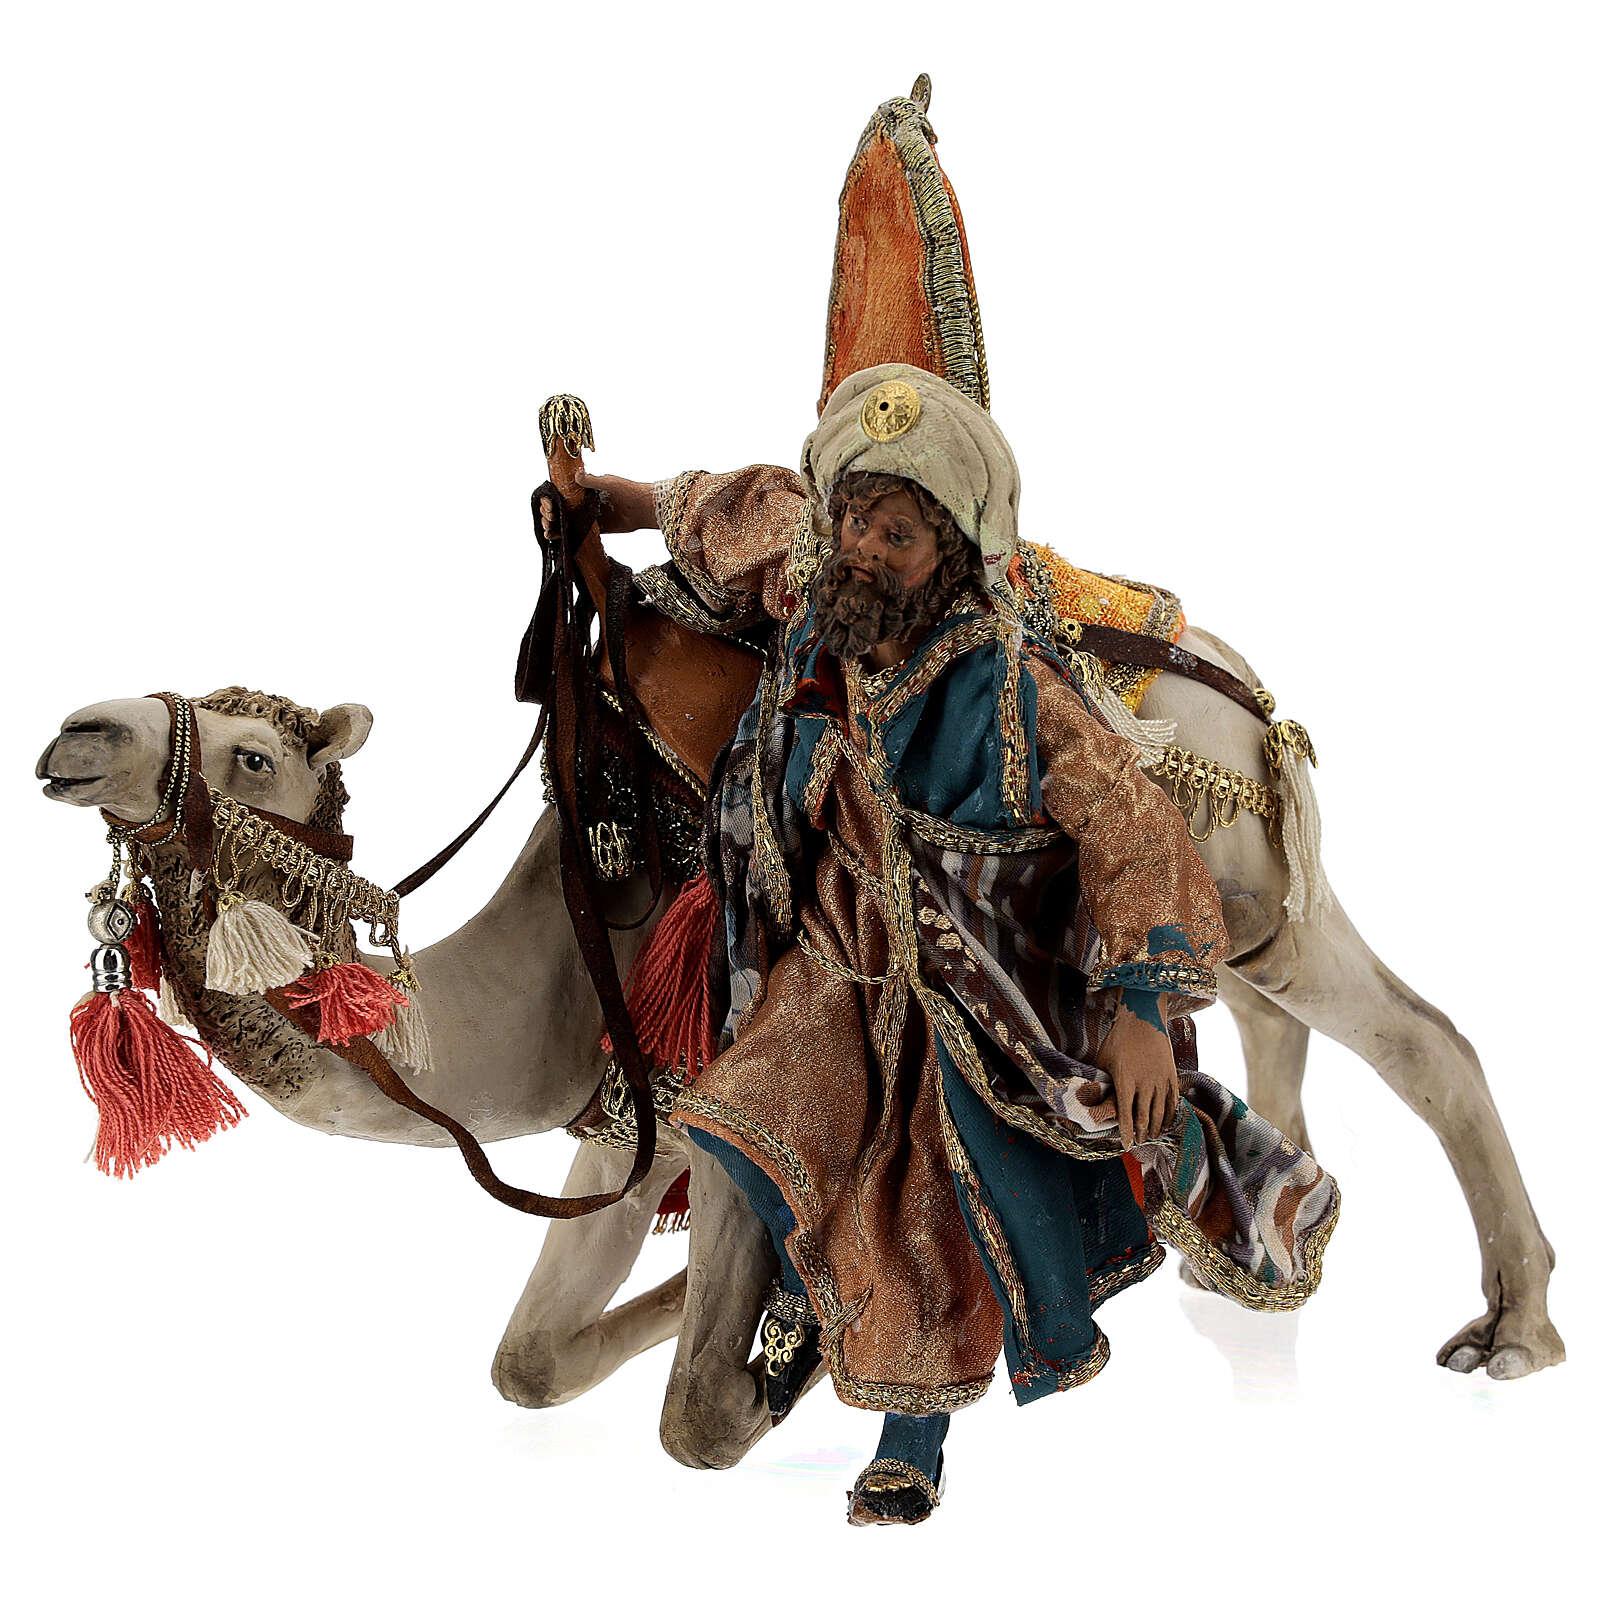 Magi coming down from camel, 13 cm Tripi nativity 4